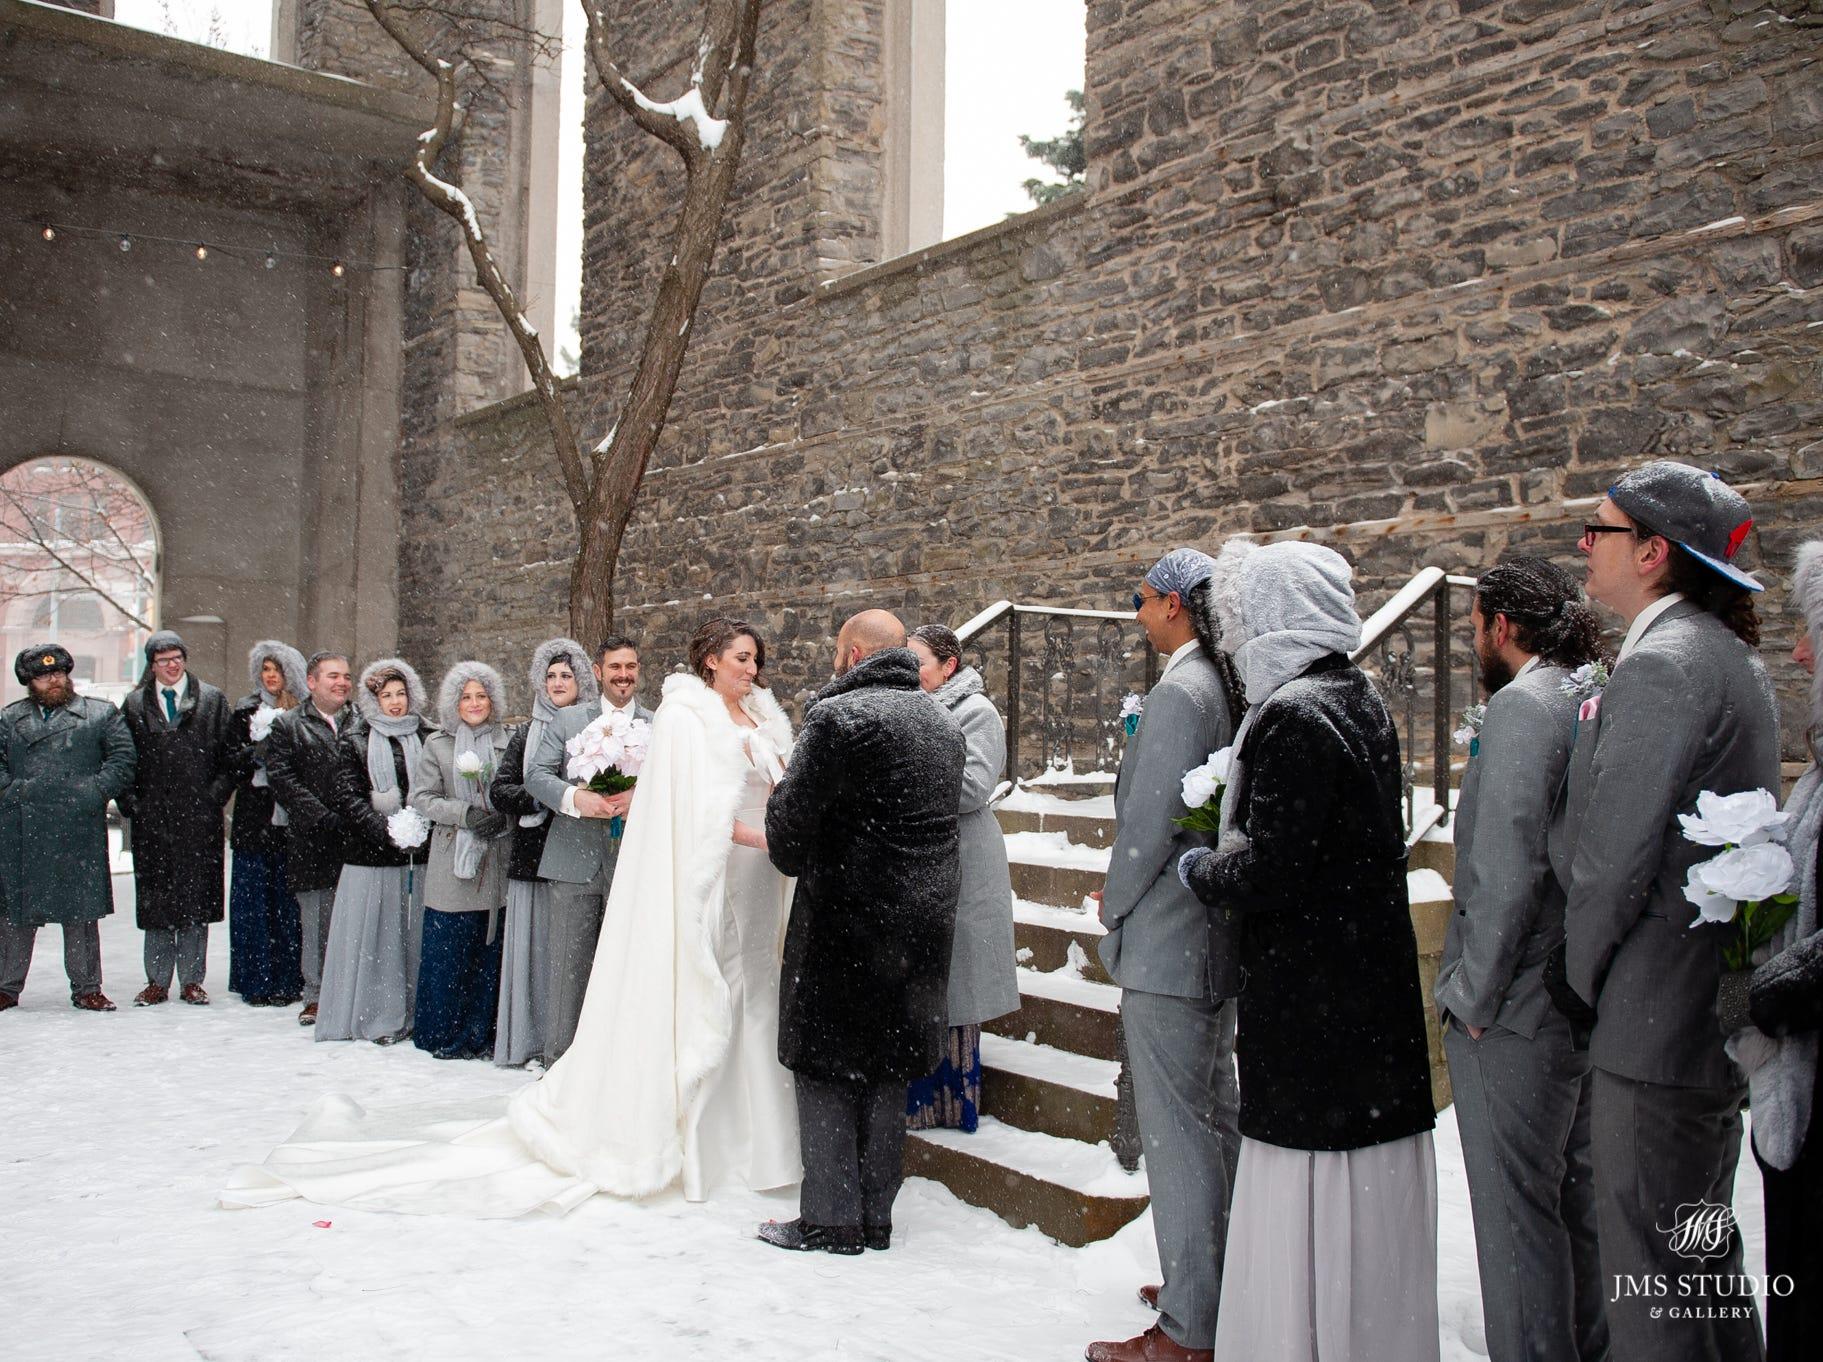 Darla and David Bragg got married in a snowstorm Saturday.